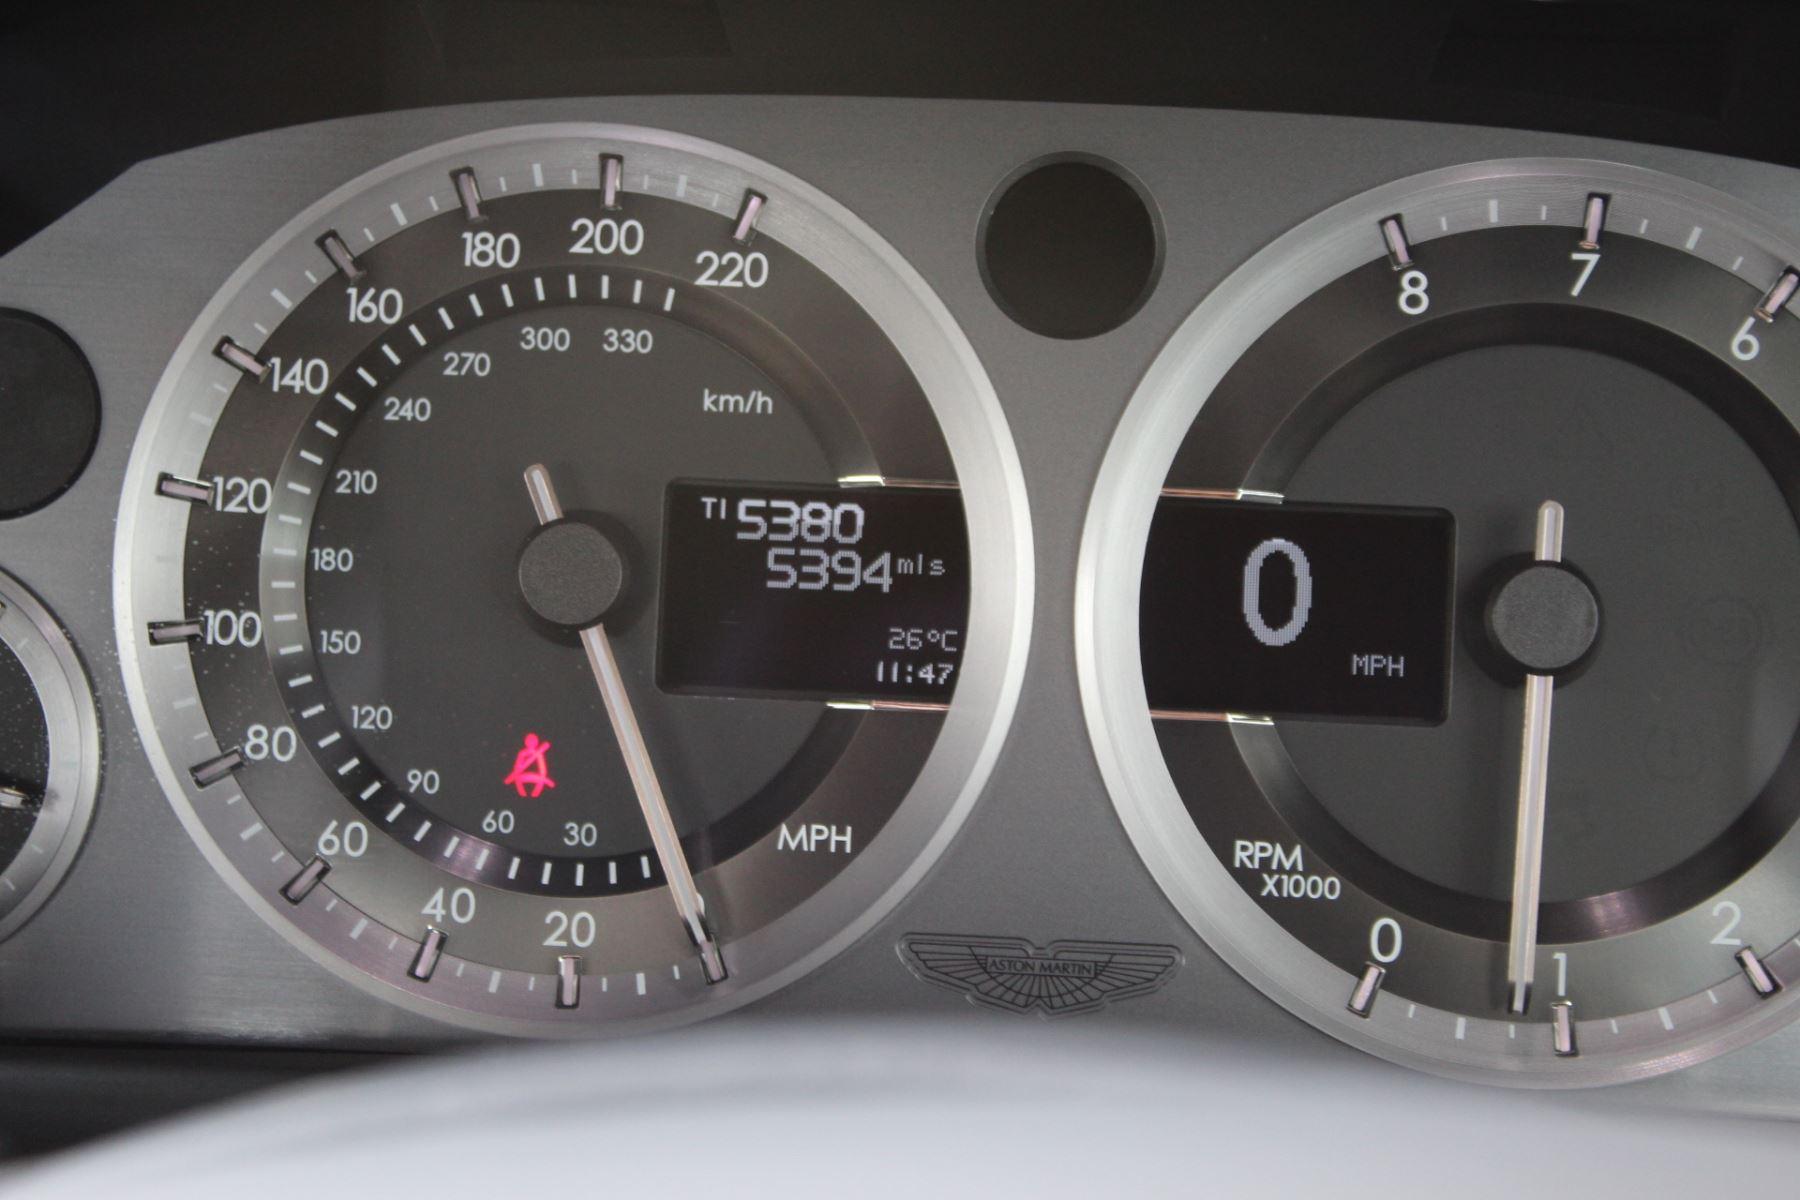 Aston Martin V8 Vantage Coupe 2dr [420] Latest Dash, 420BHP image 11